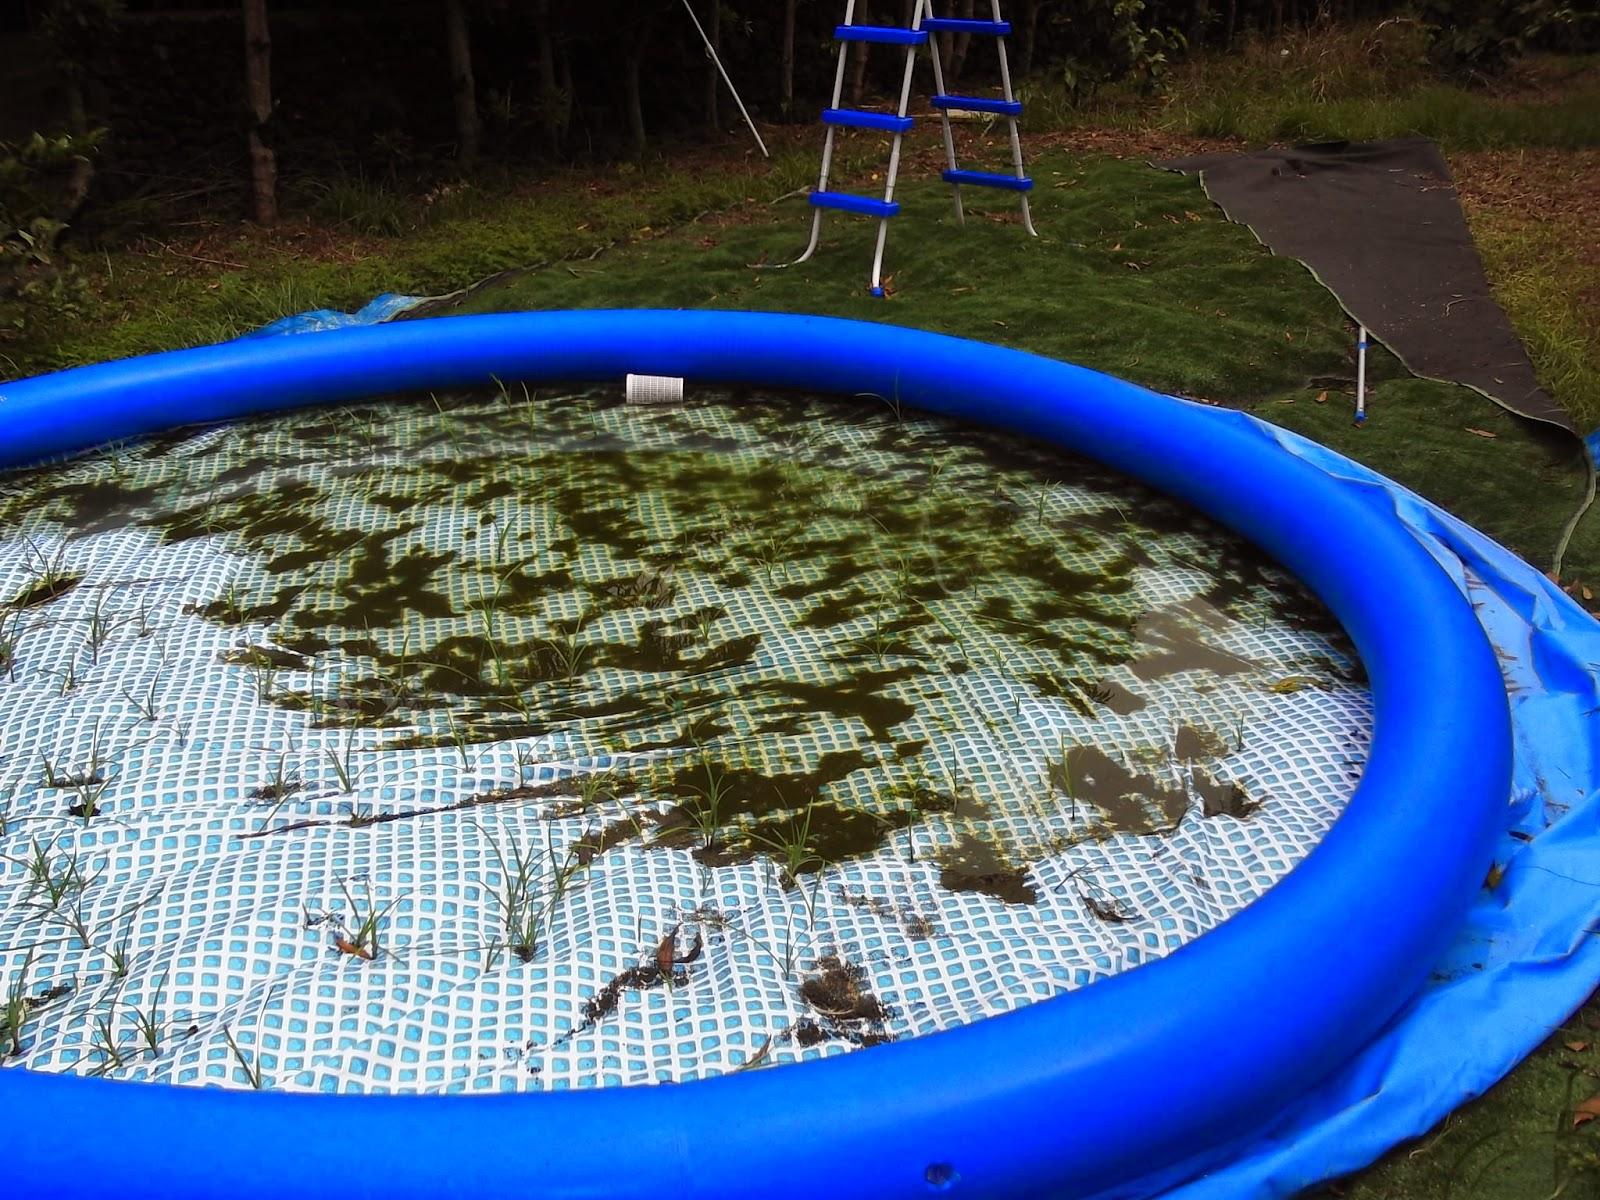 piscina desmontable problemas